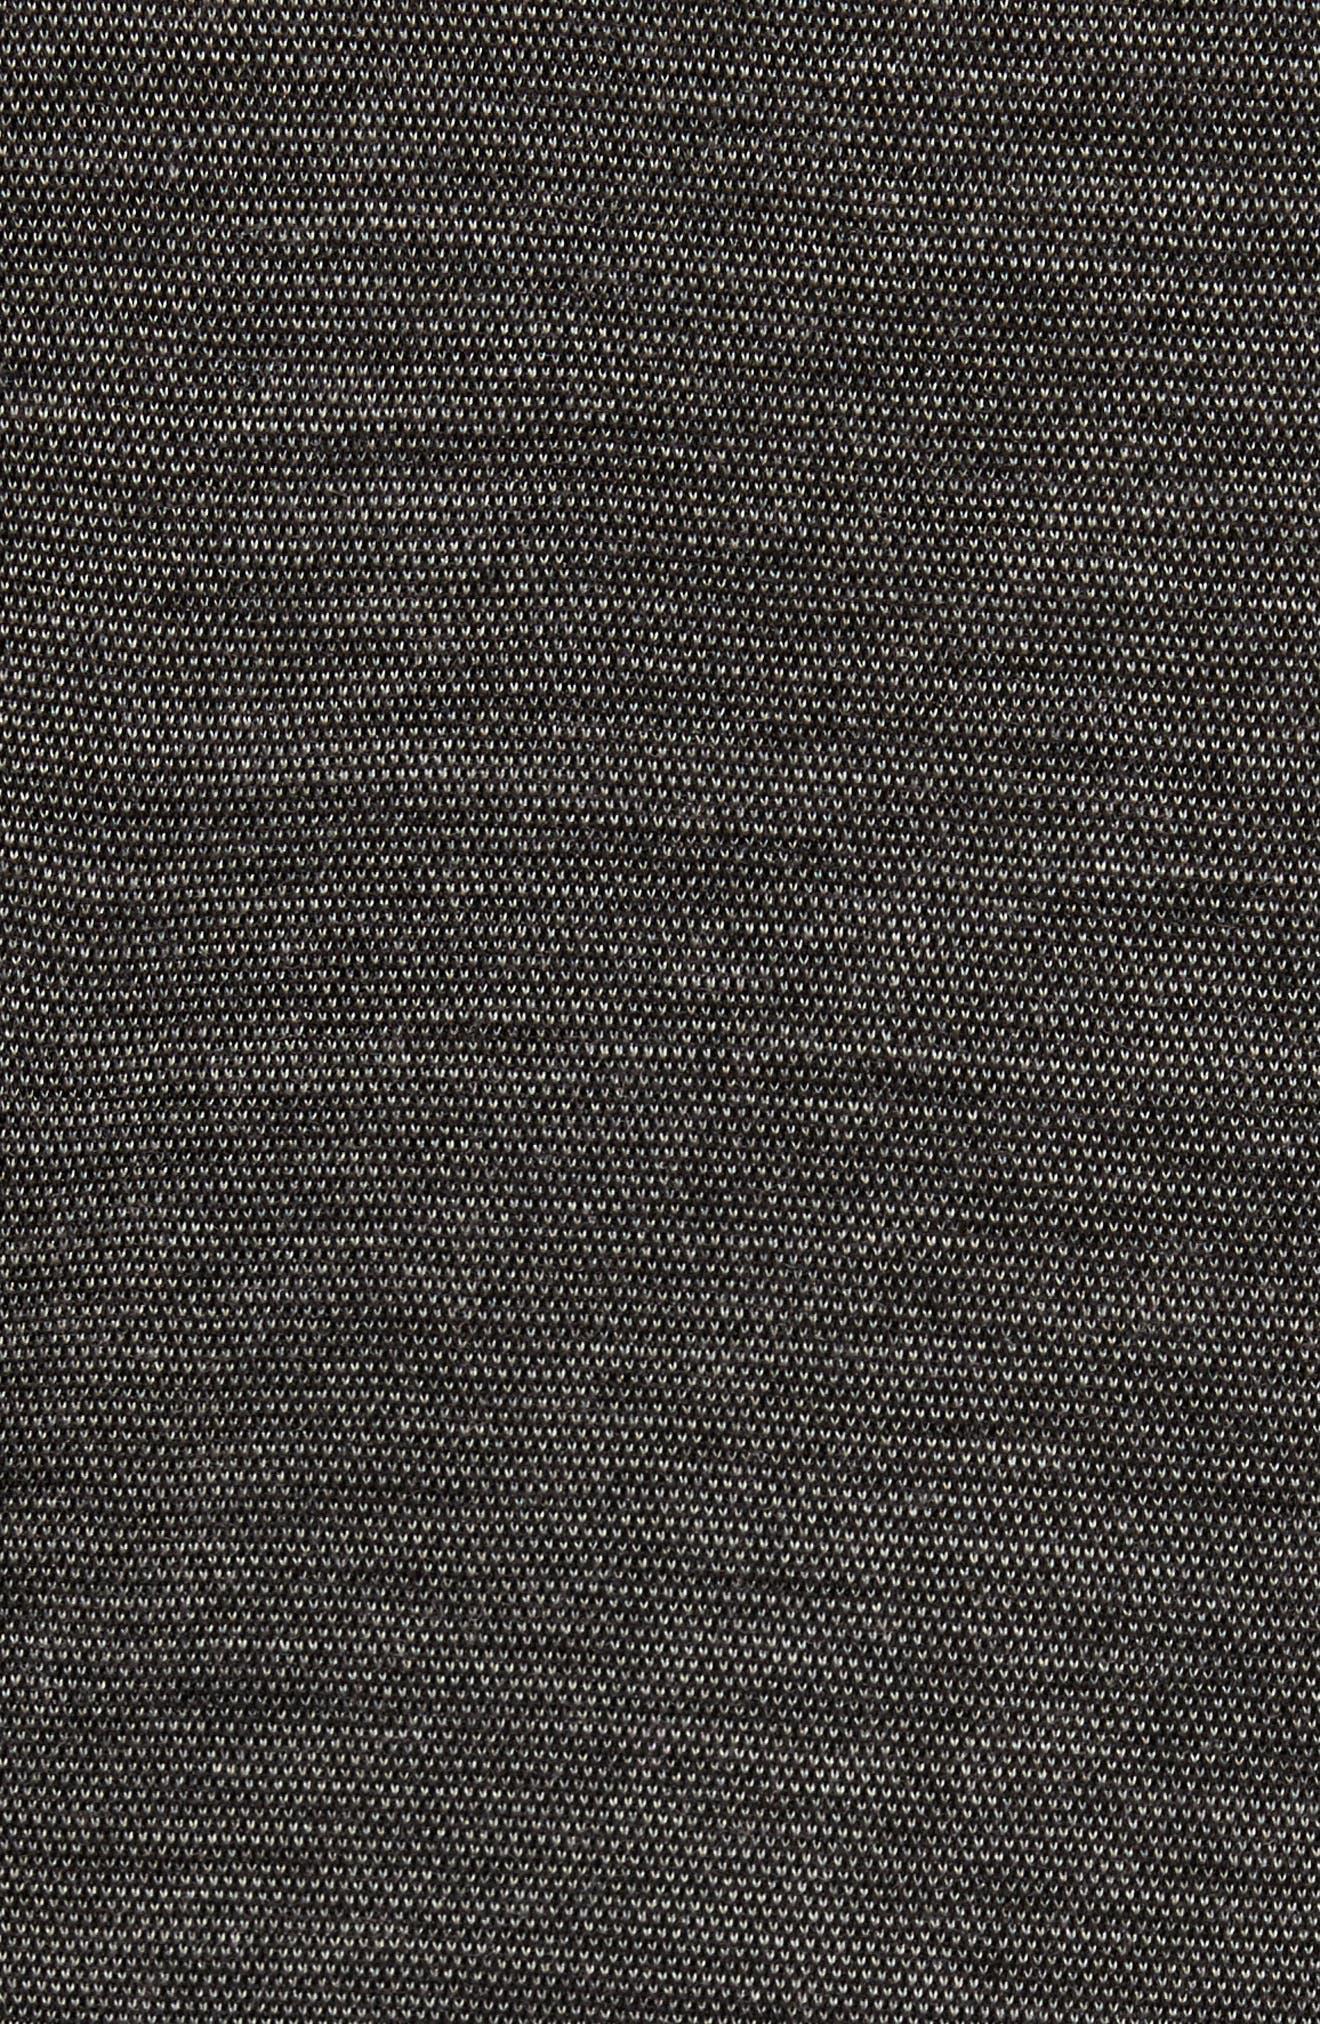 250 Sport Merino Wool Jacket,                             Alternate thumbnail 5, color,                             001